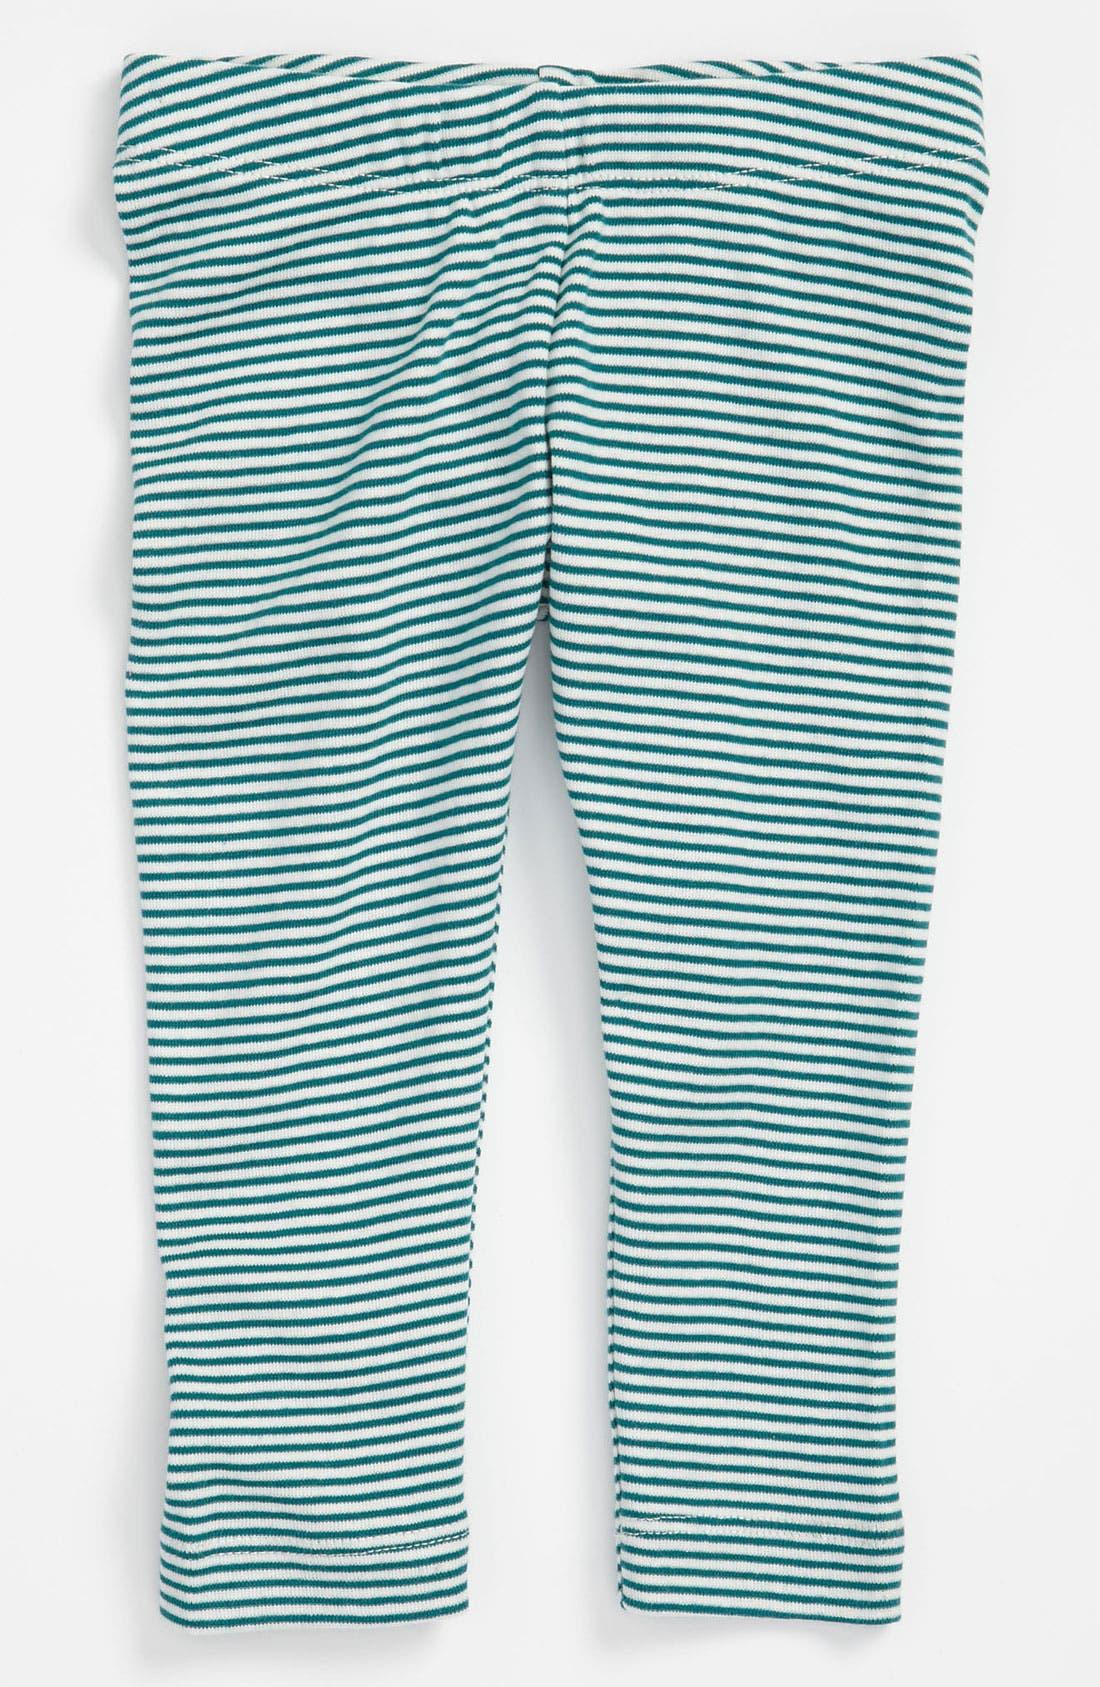 Alternate Image 1 Selected - Tea Collection 'Skinny Stripe' Leggings (Little Girls & Big Girls)